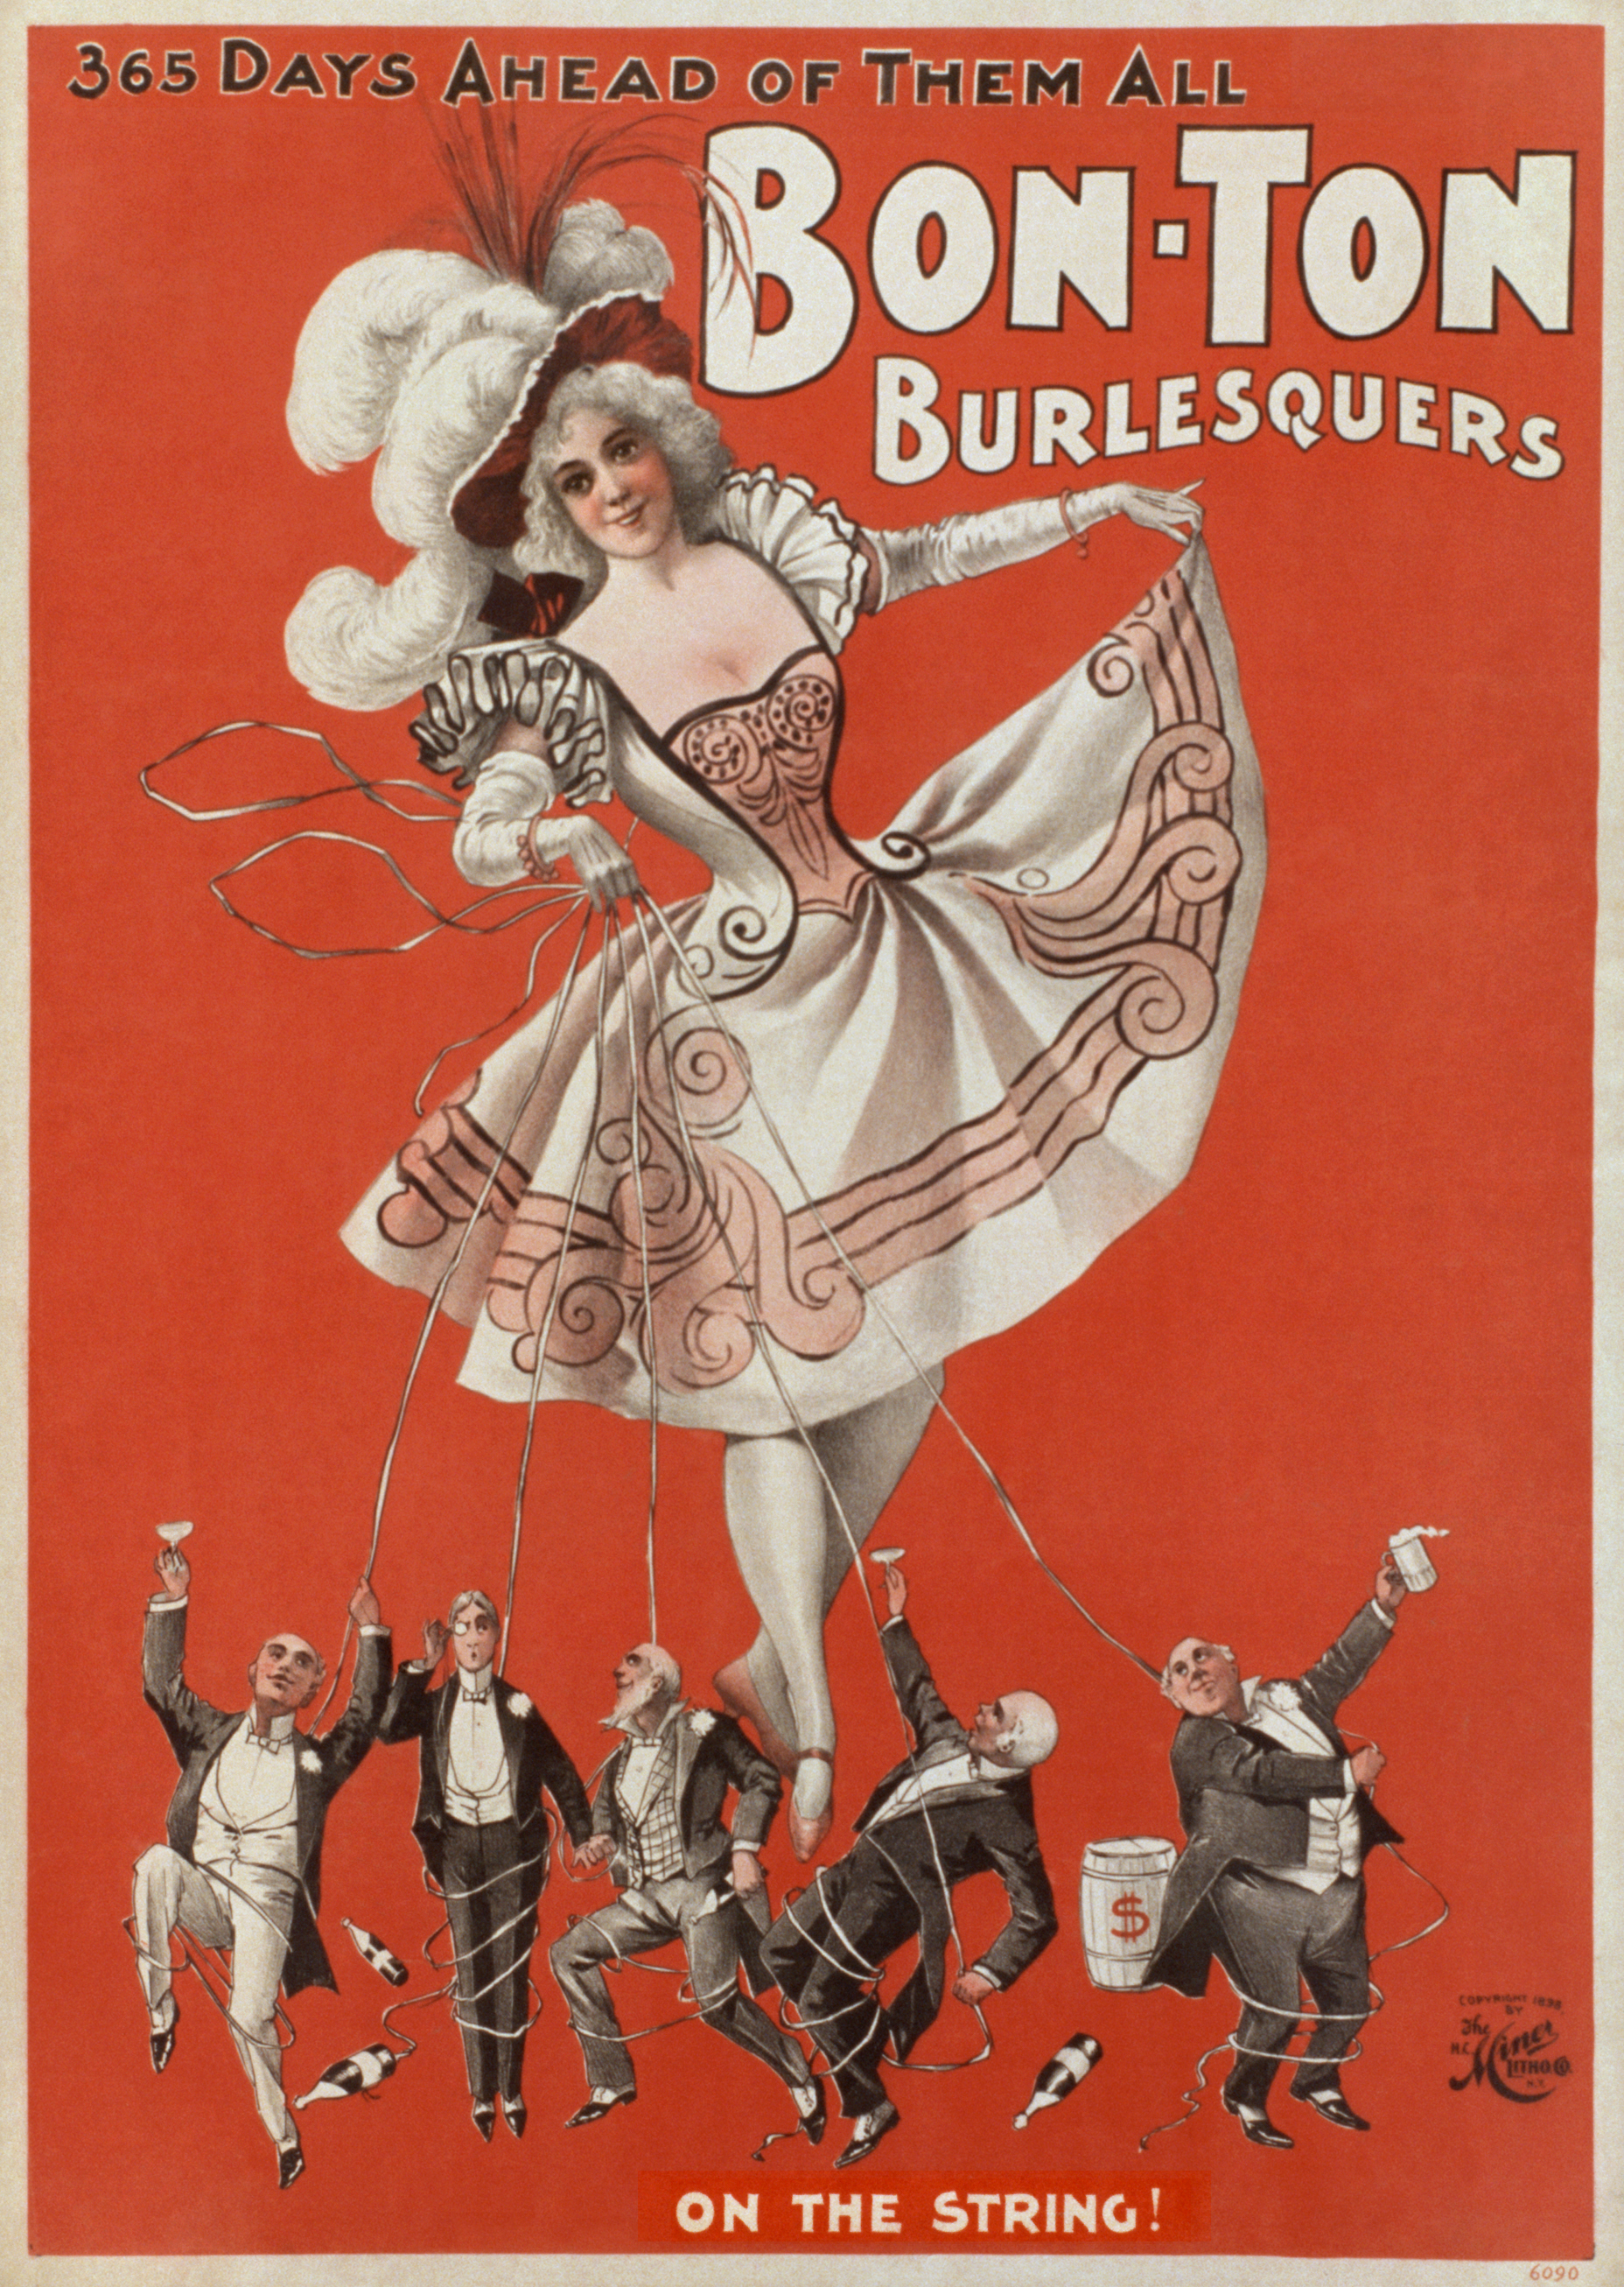 Depiction of Burlesque